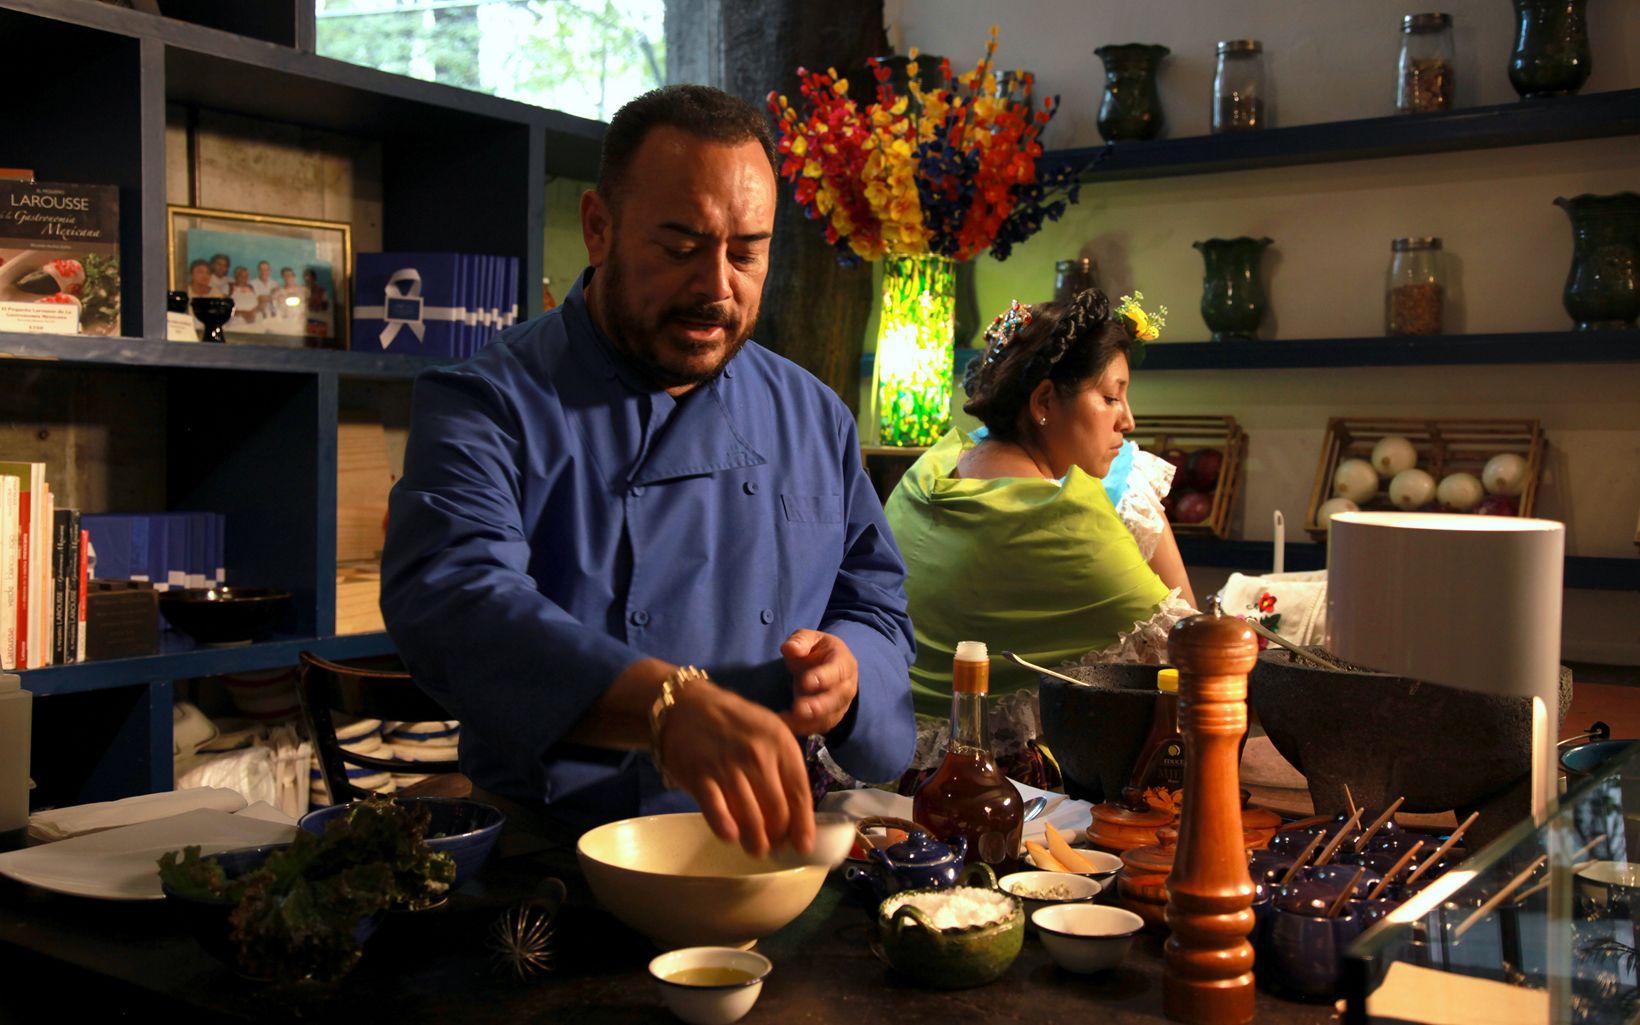 Mexican c hef Ricardo Munoz prepares a dish in his kitc